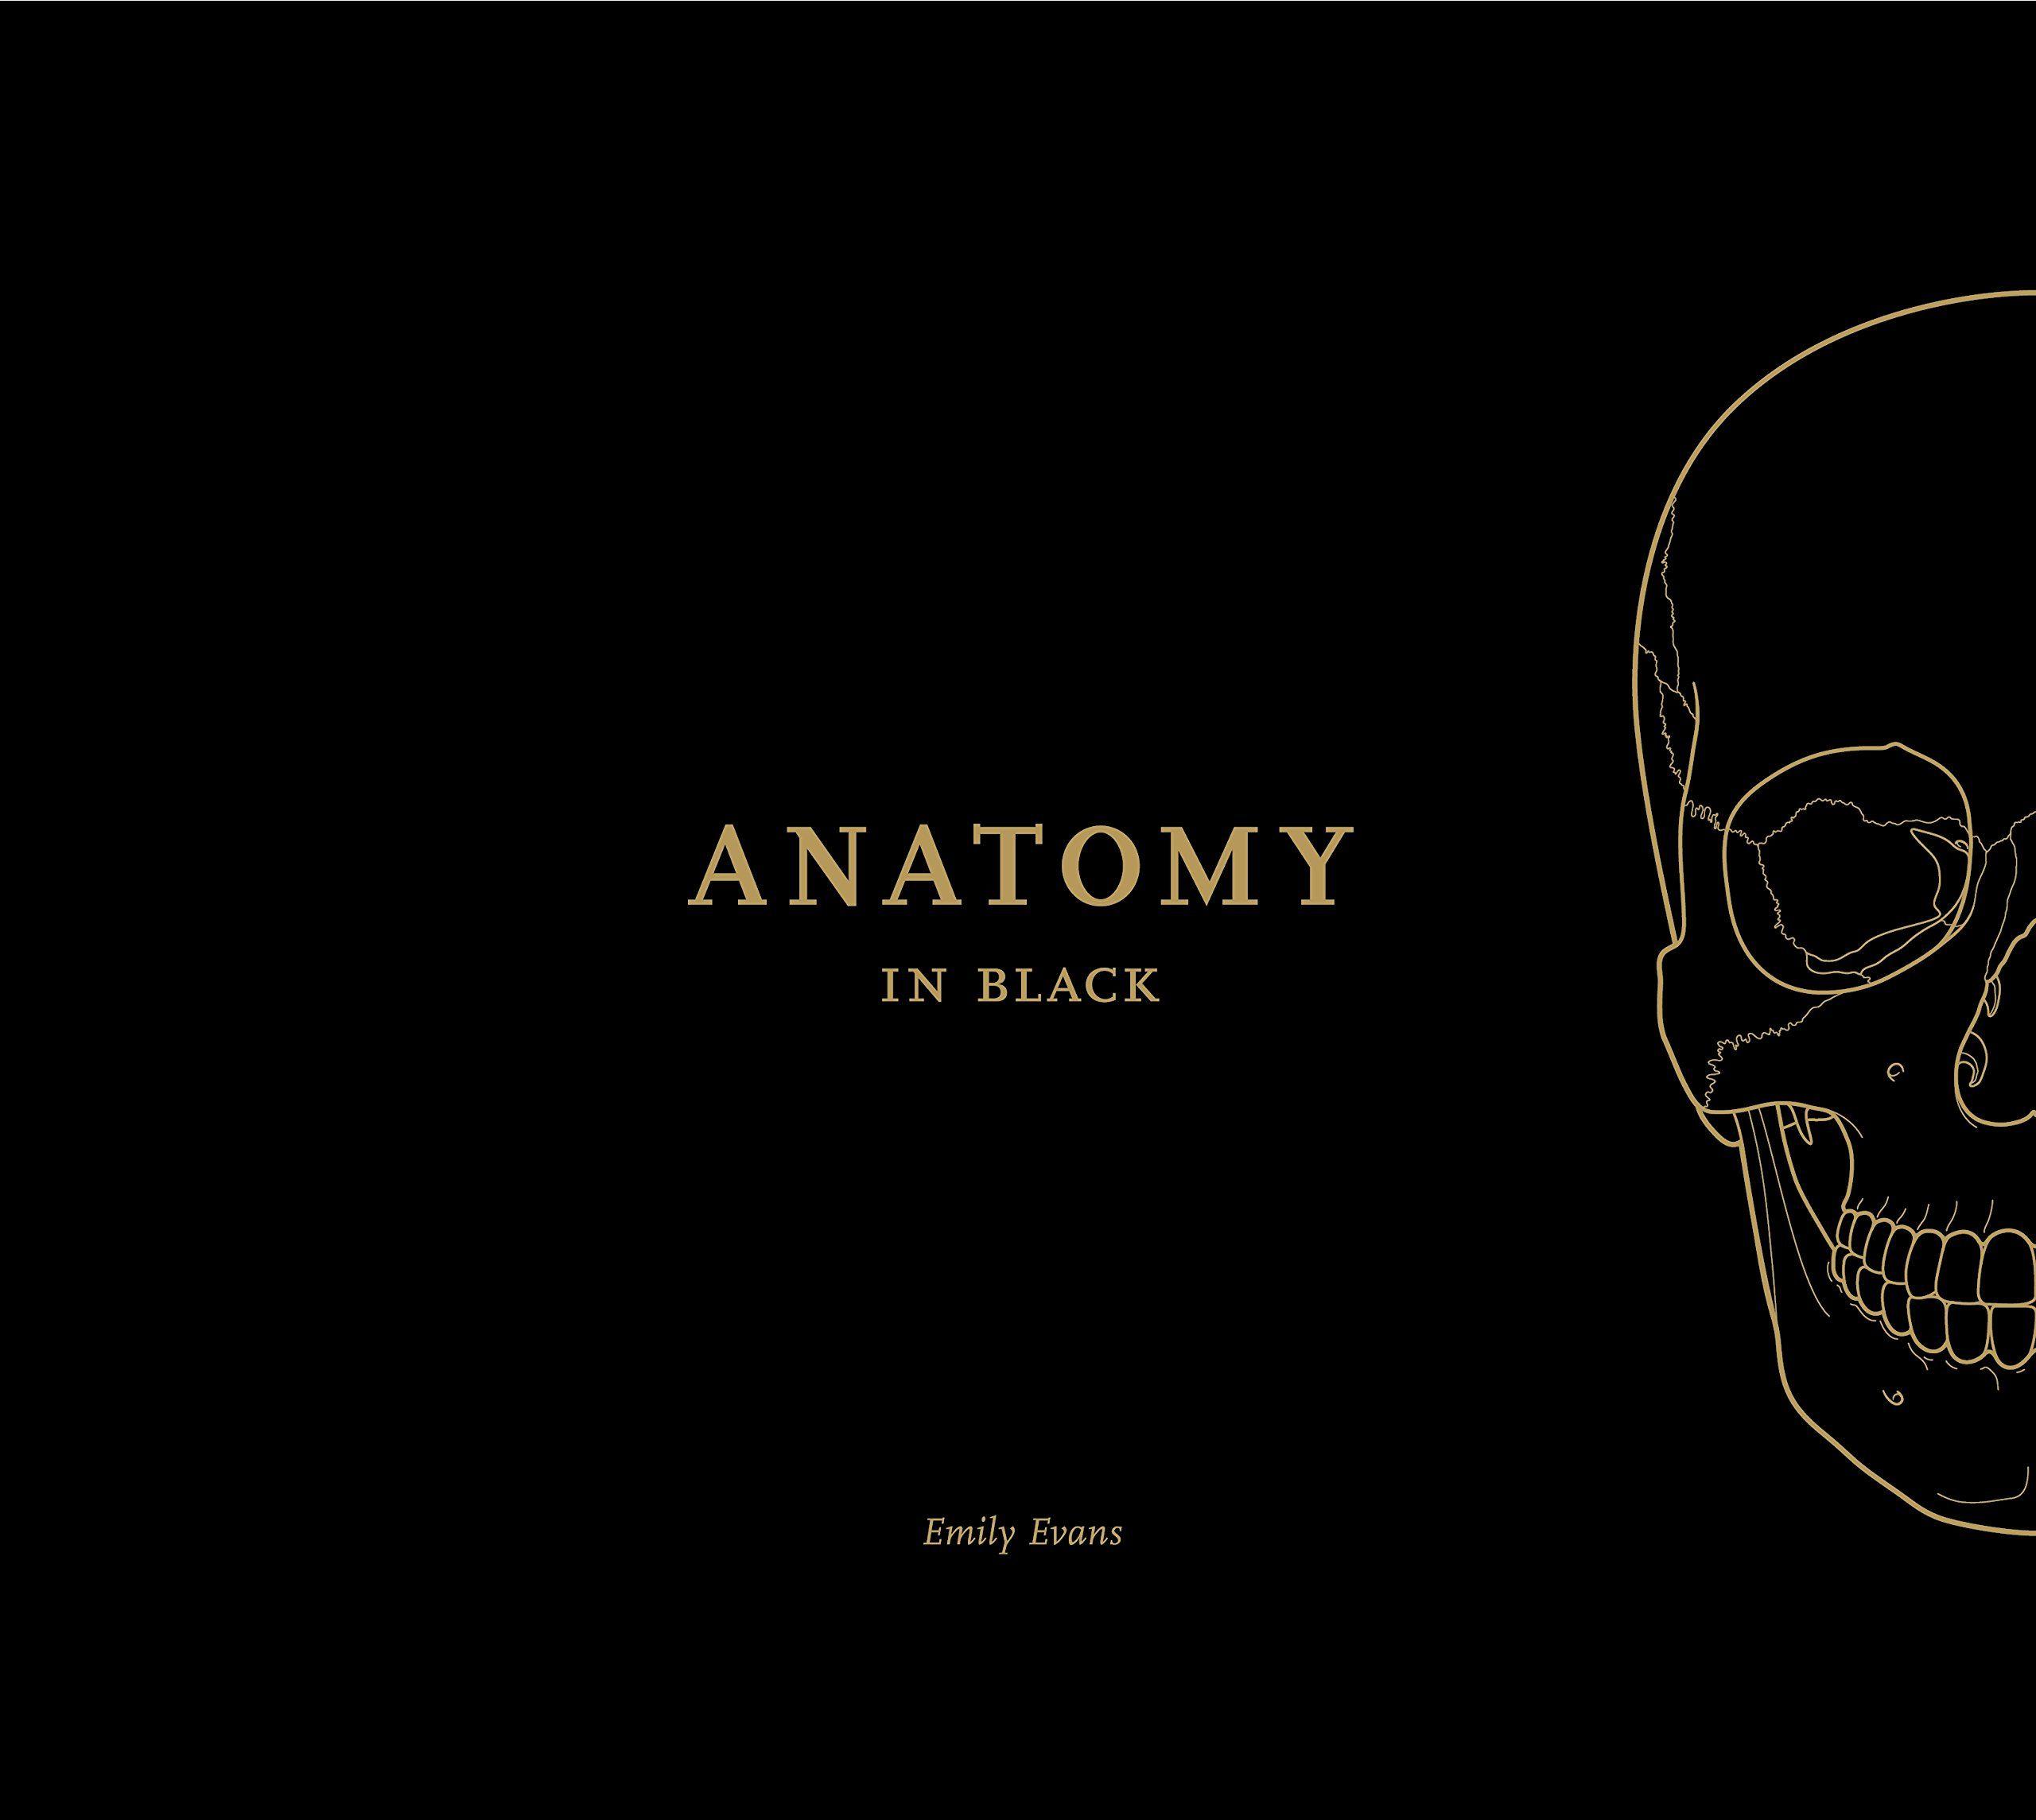 Anatomy in black emily evans 9781905367580